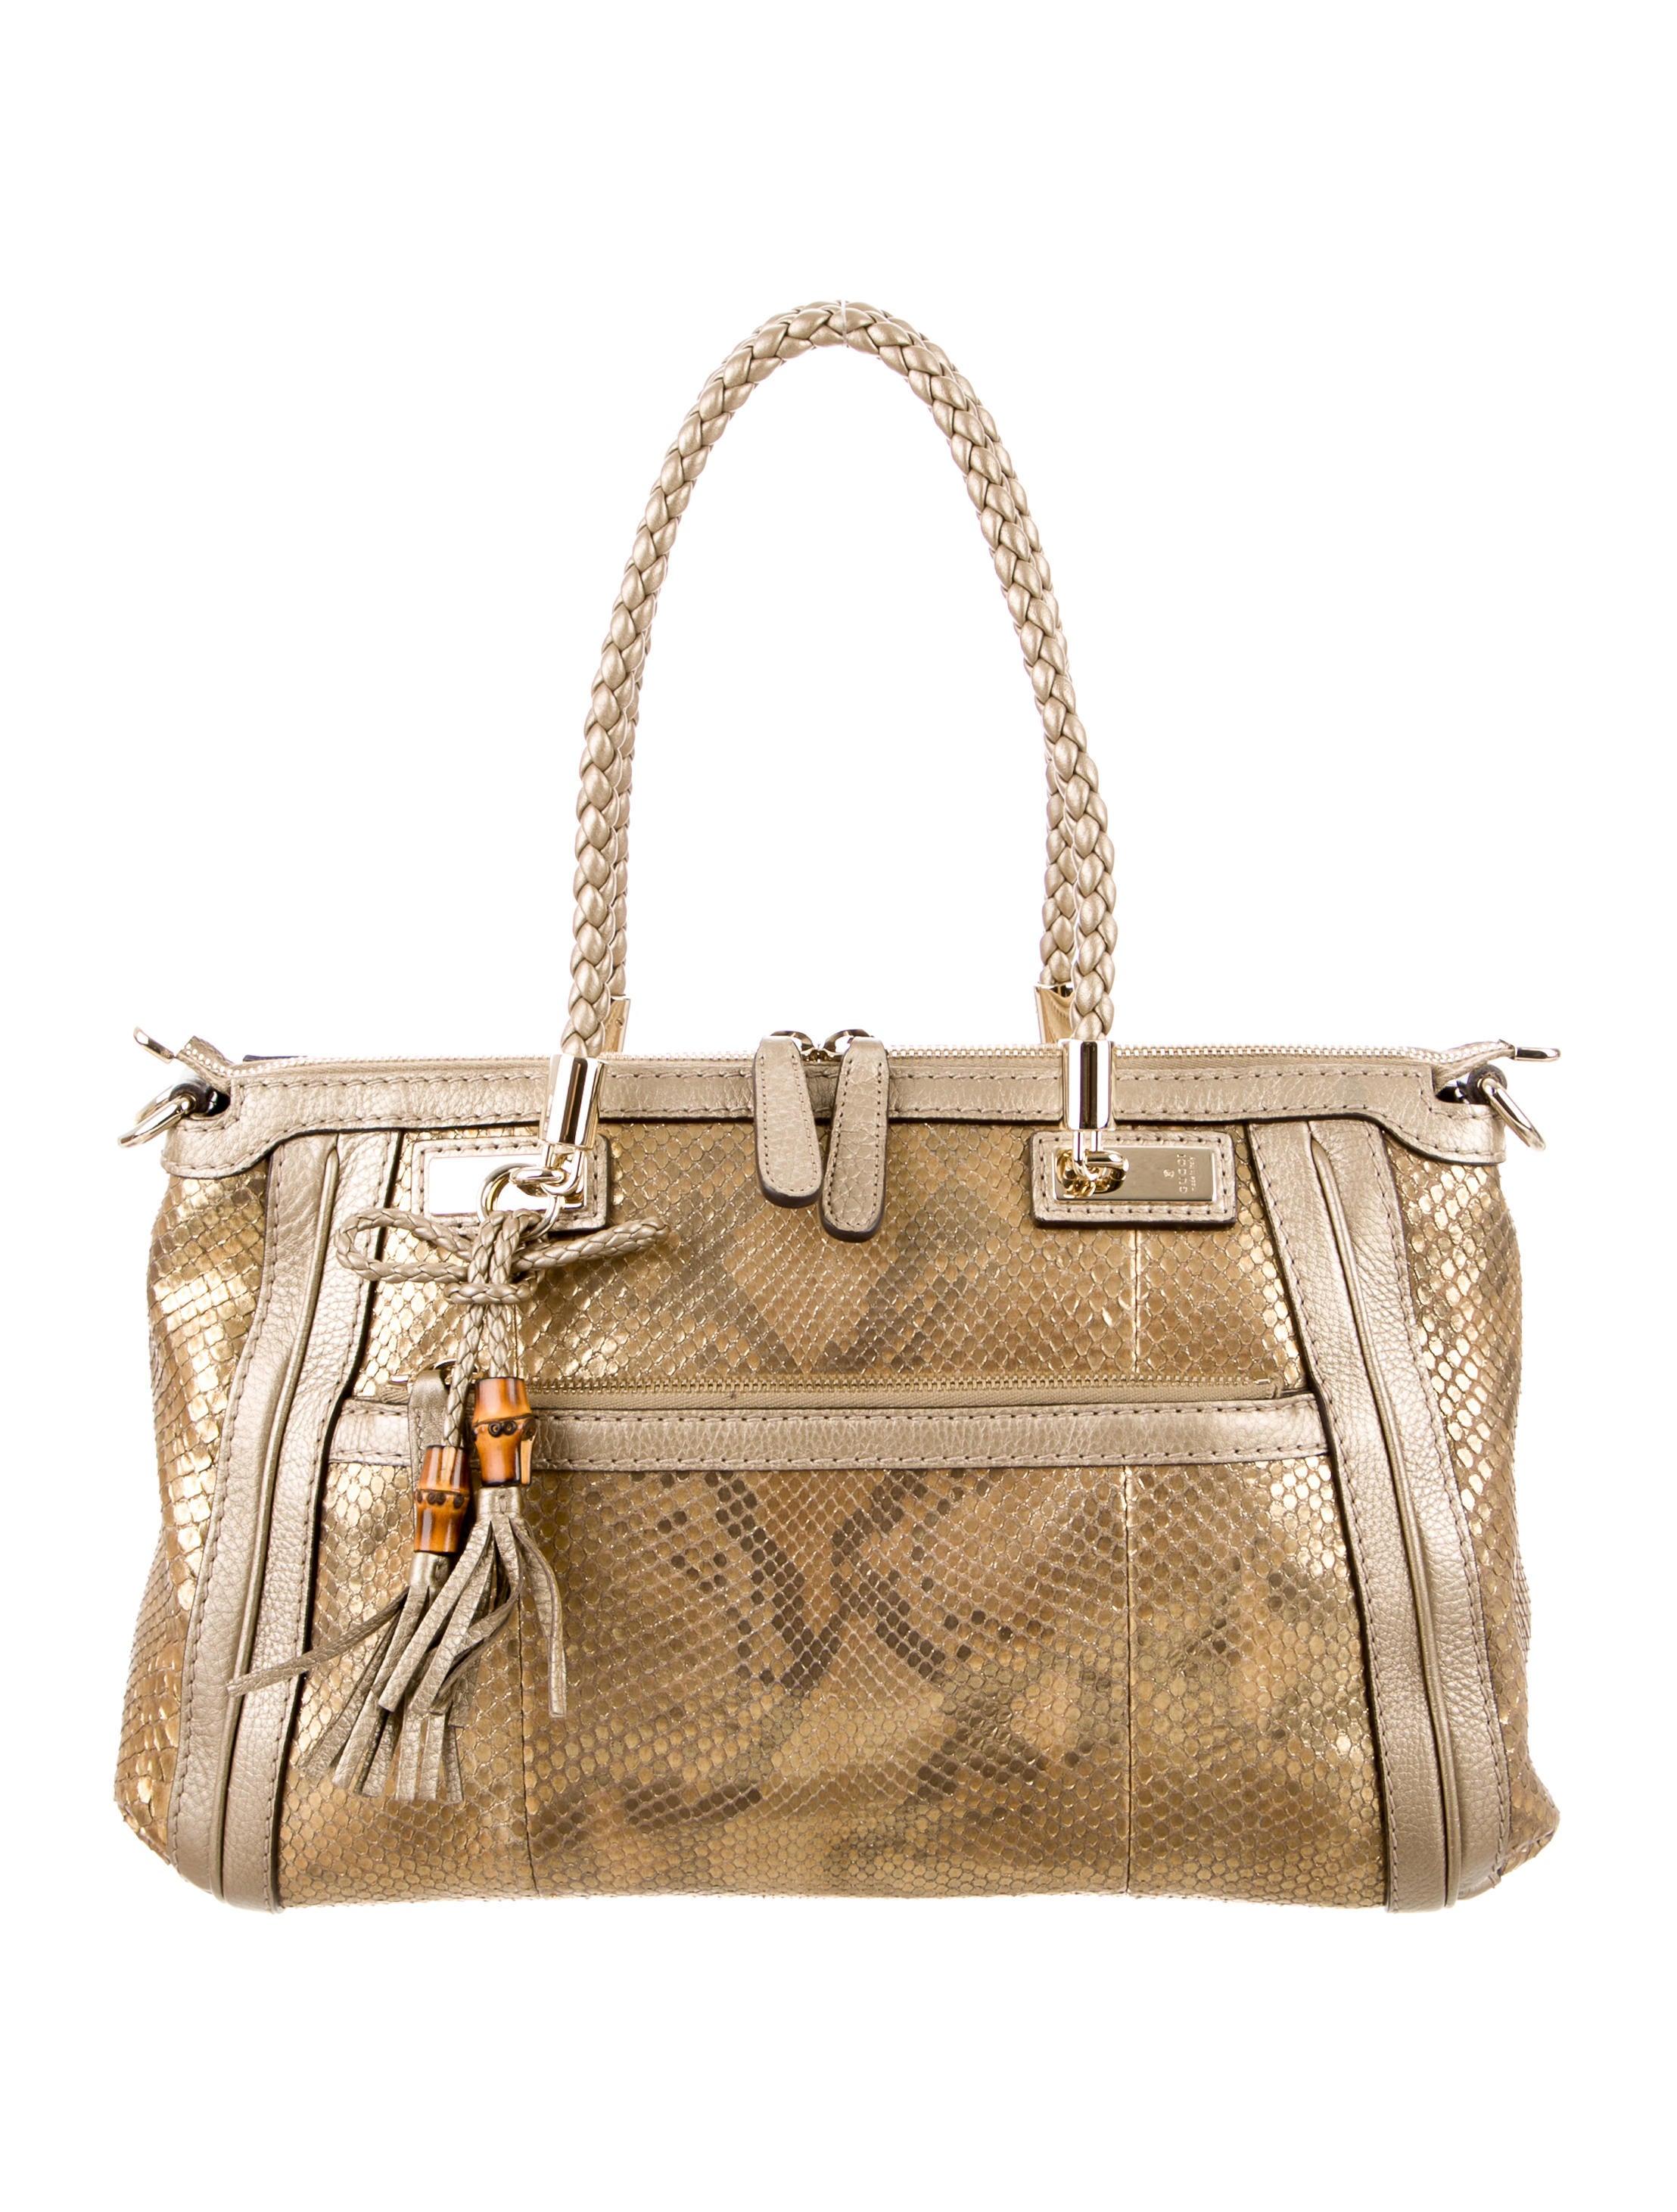 36b51668136 Gucci Python Bella Top Handle Bag - Handbags - GUC118162